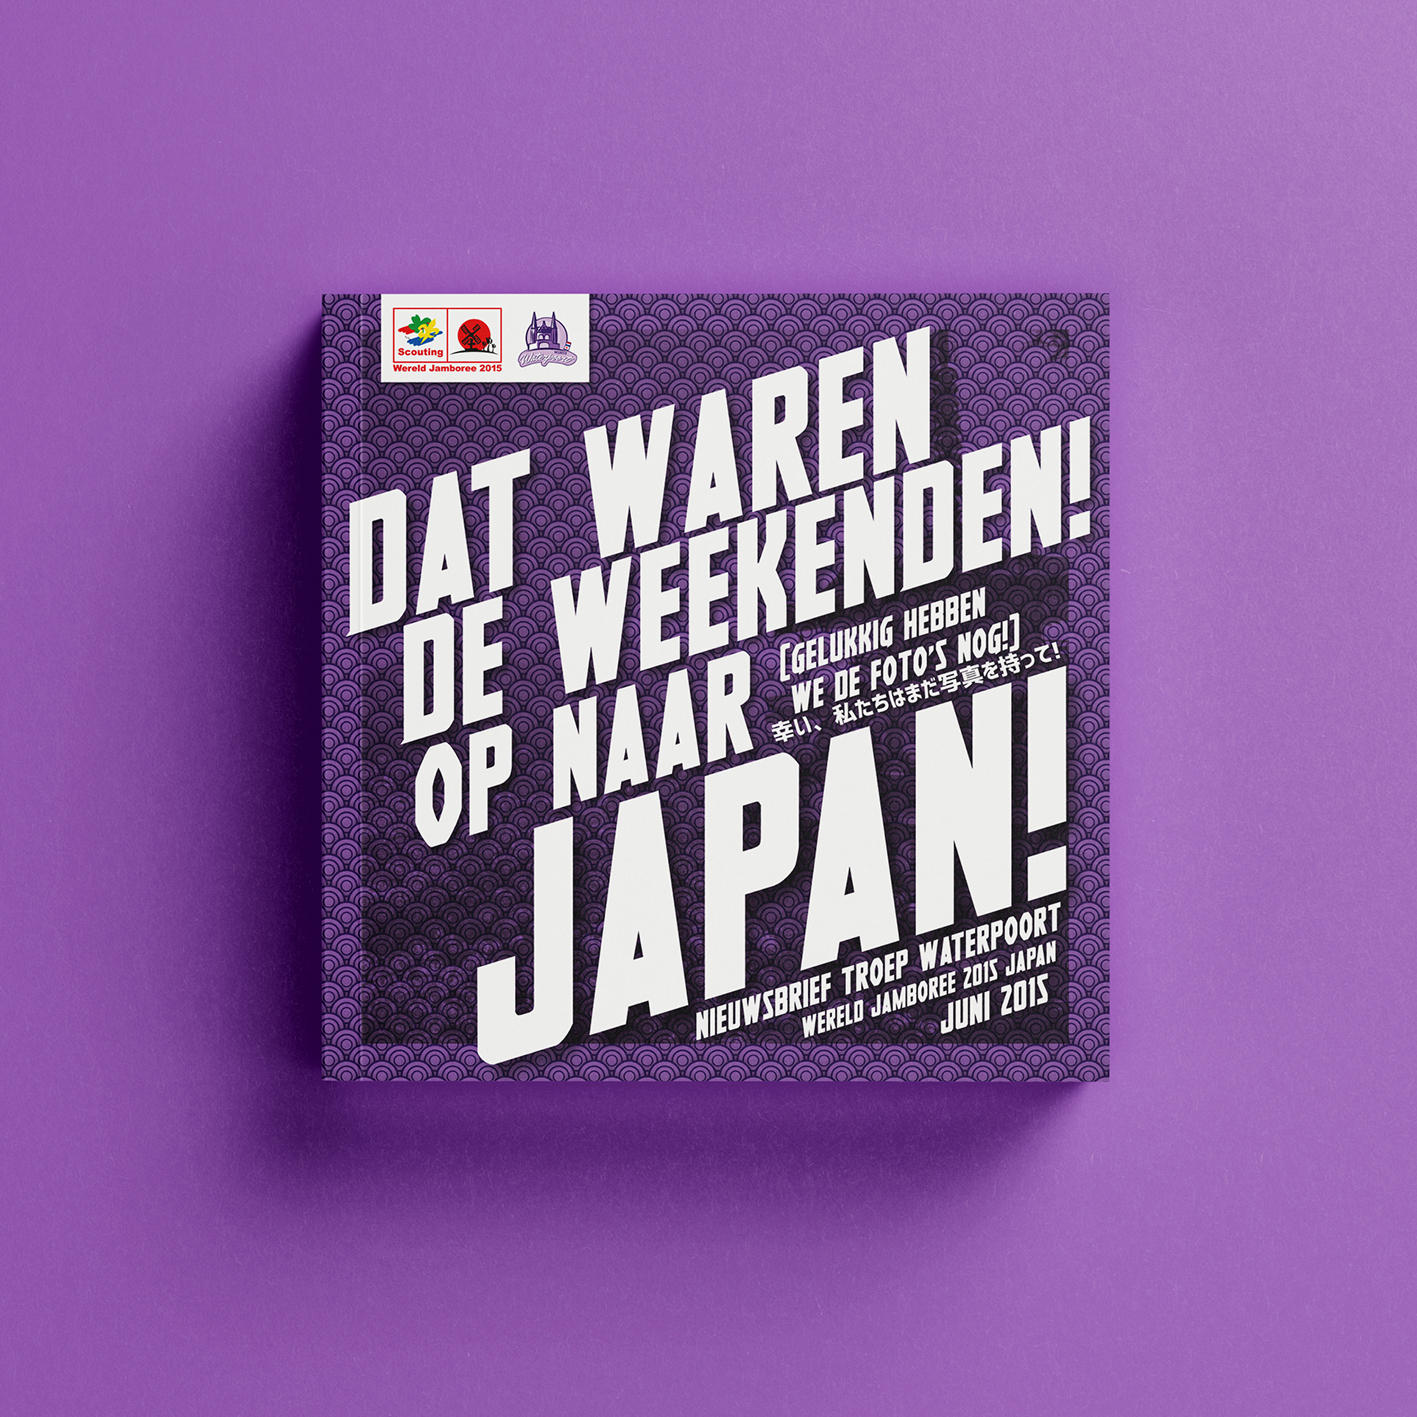 Nieuwsbrief World Scout Jamboree Japan